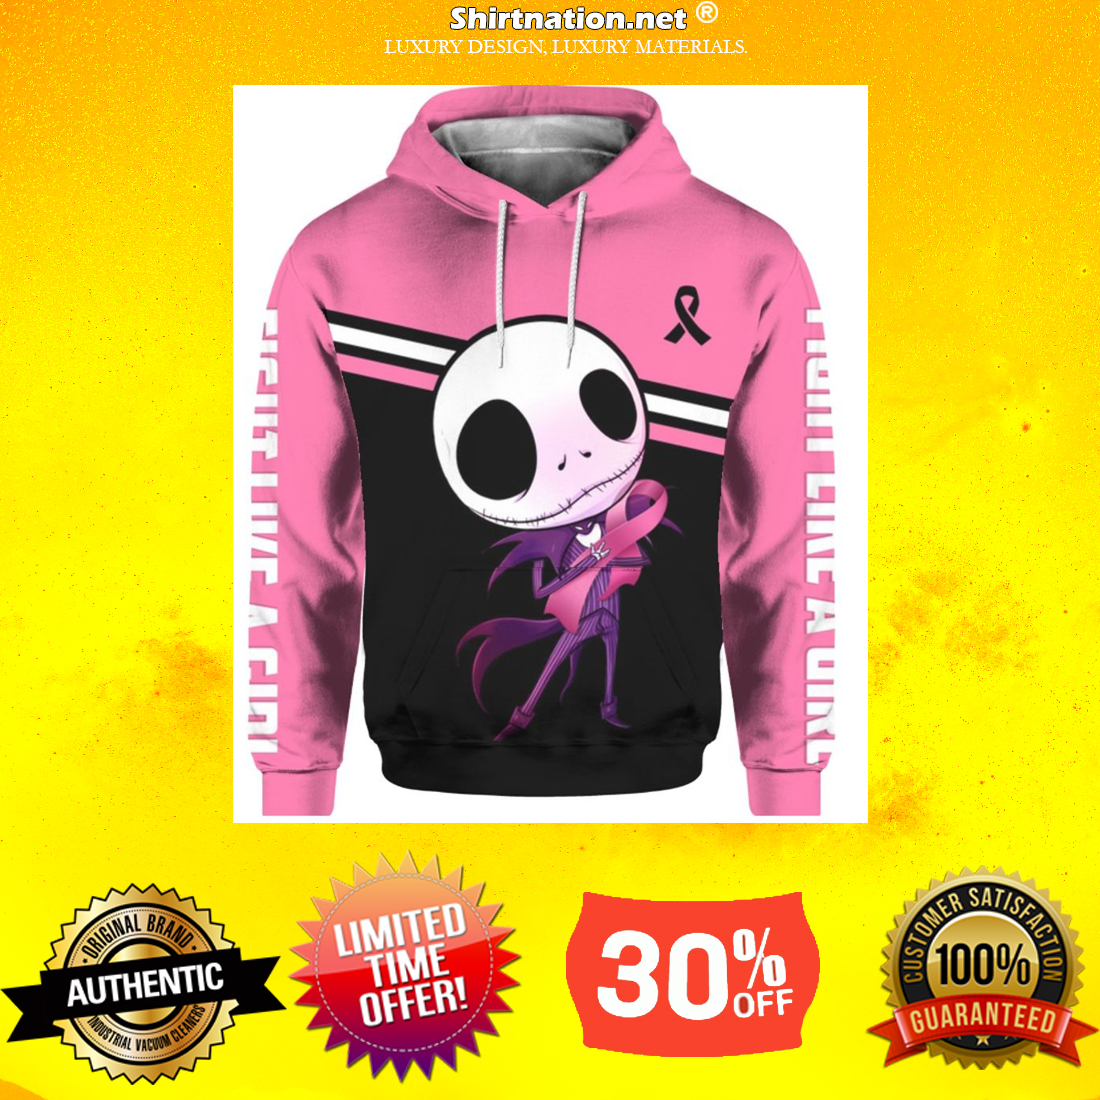 Cancer awareness Jack Skellington fight like a girl 3d hoodies